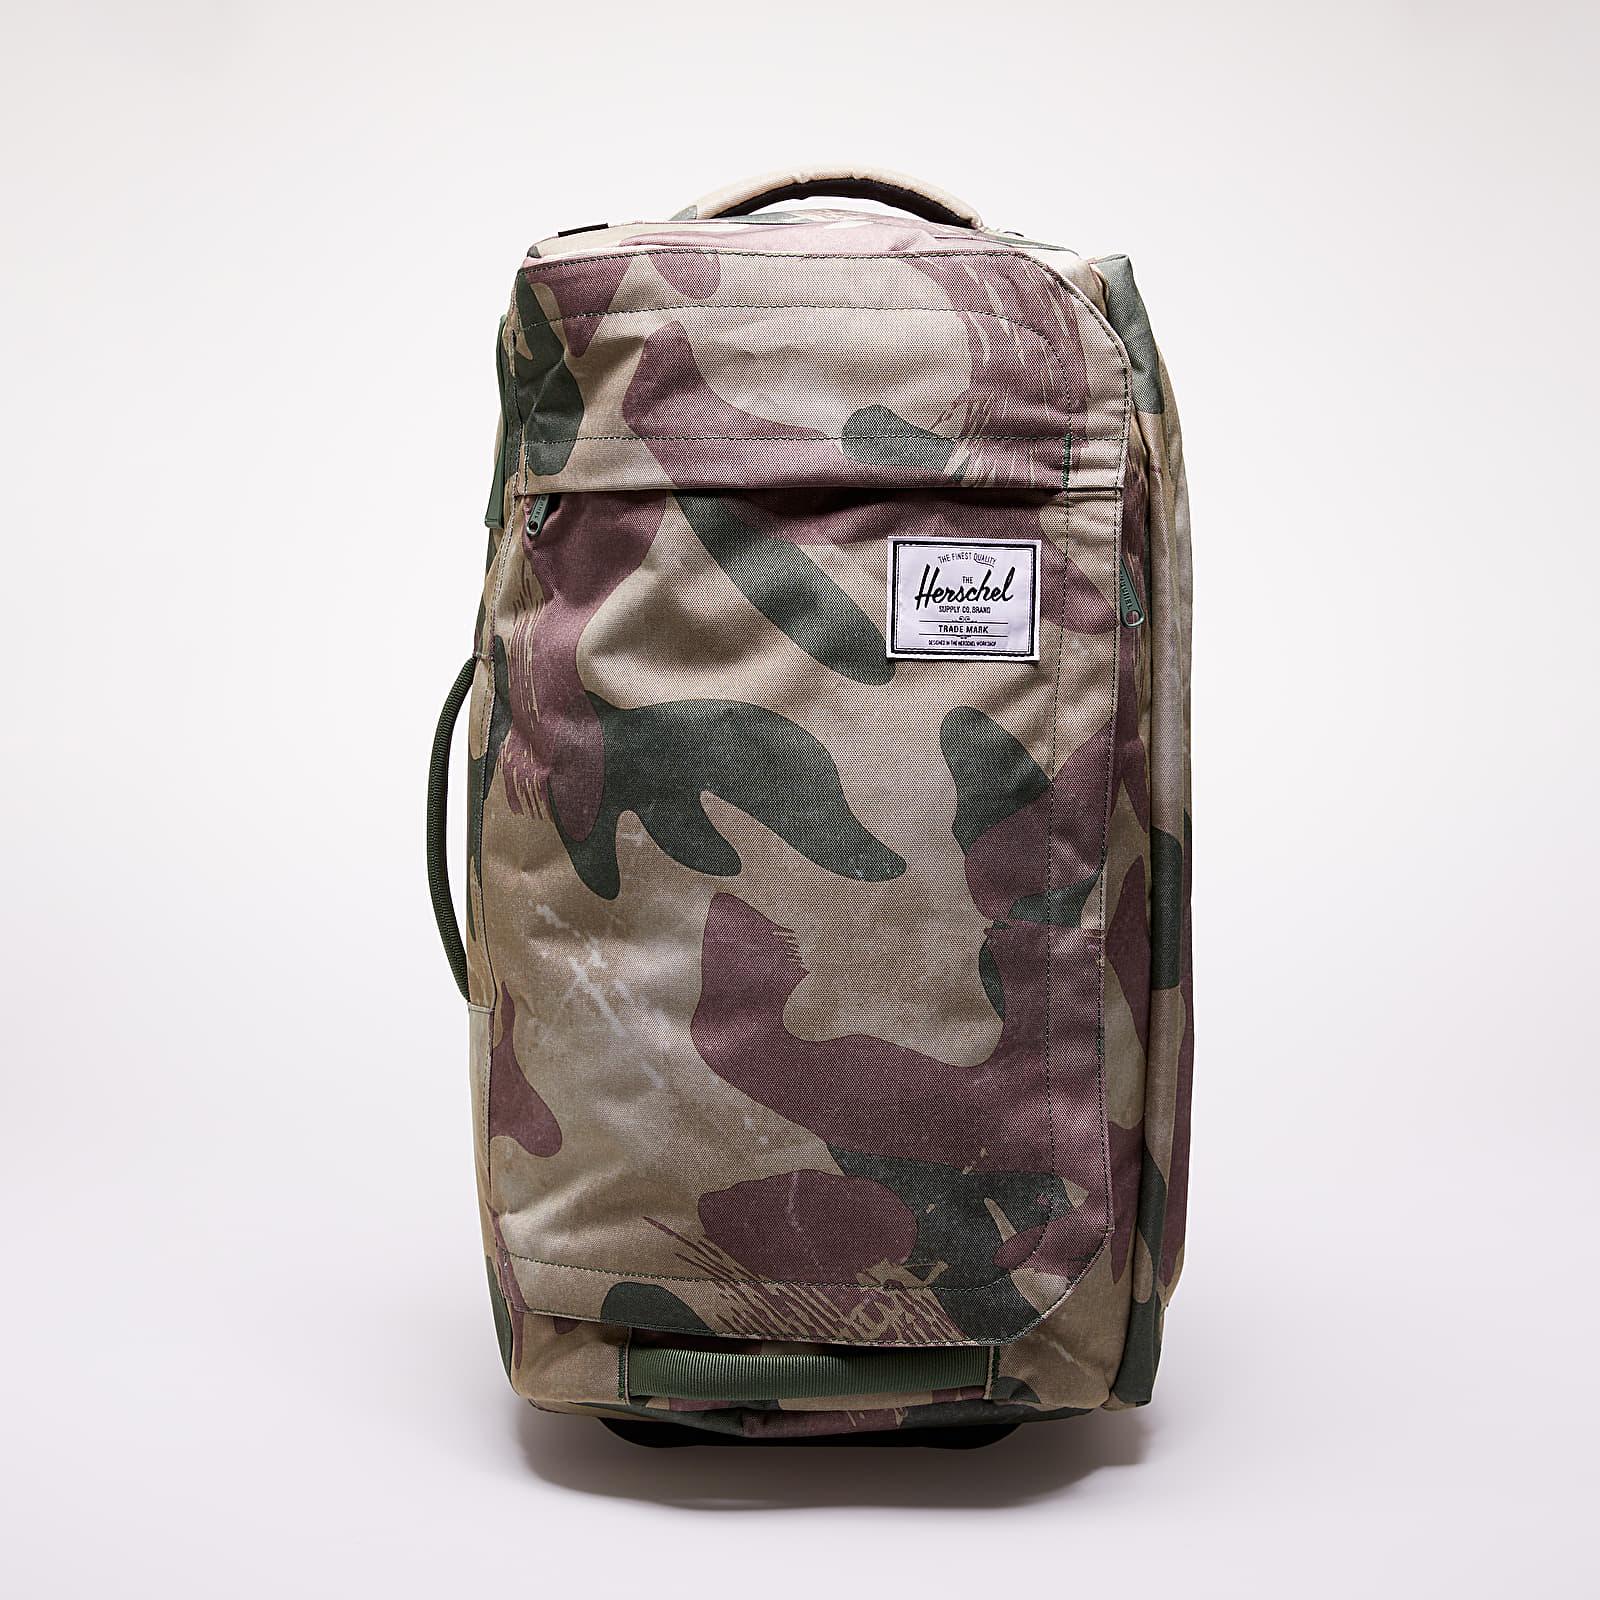 Zaini e borse Herschel Supply Co. Outfitter Wheelie Luggage Brushstroke Camo